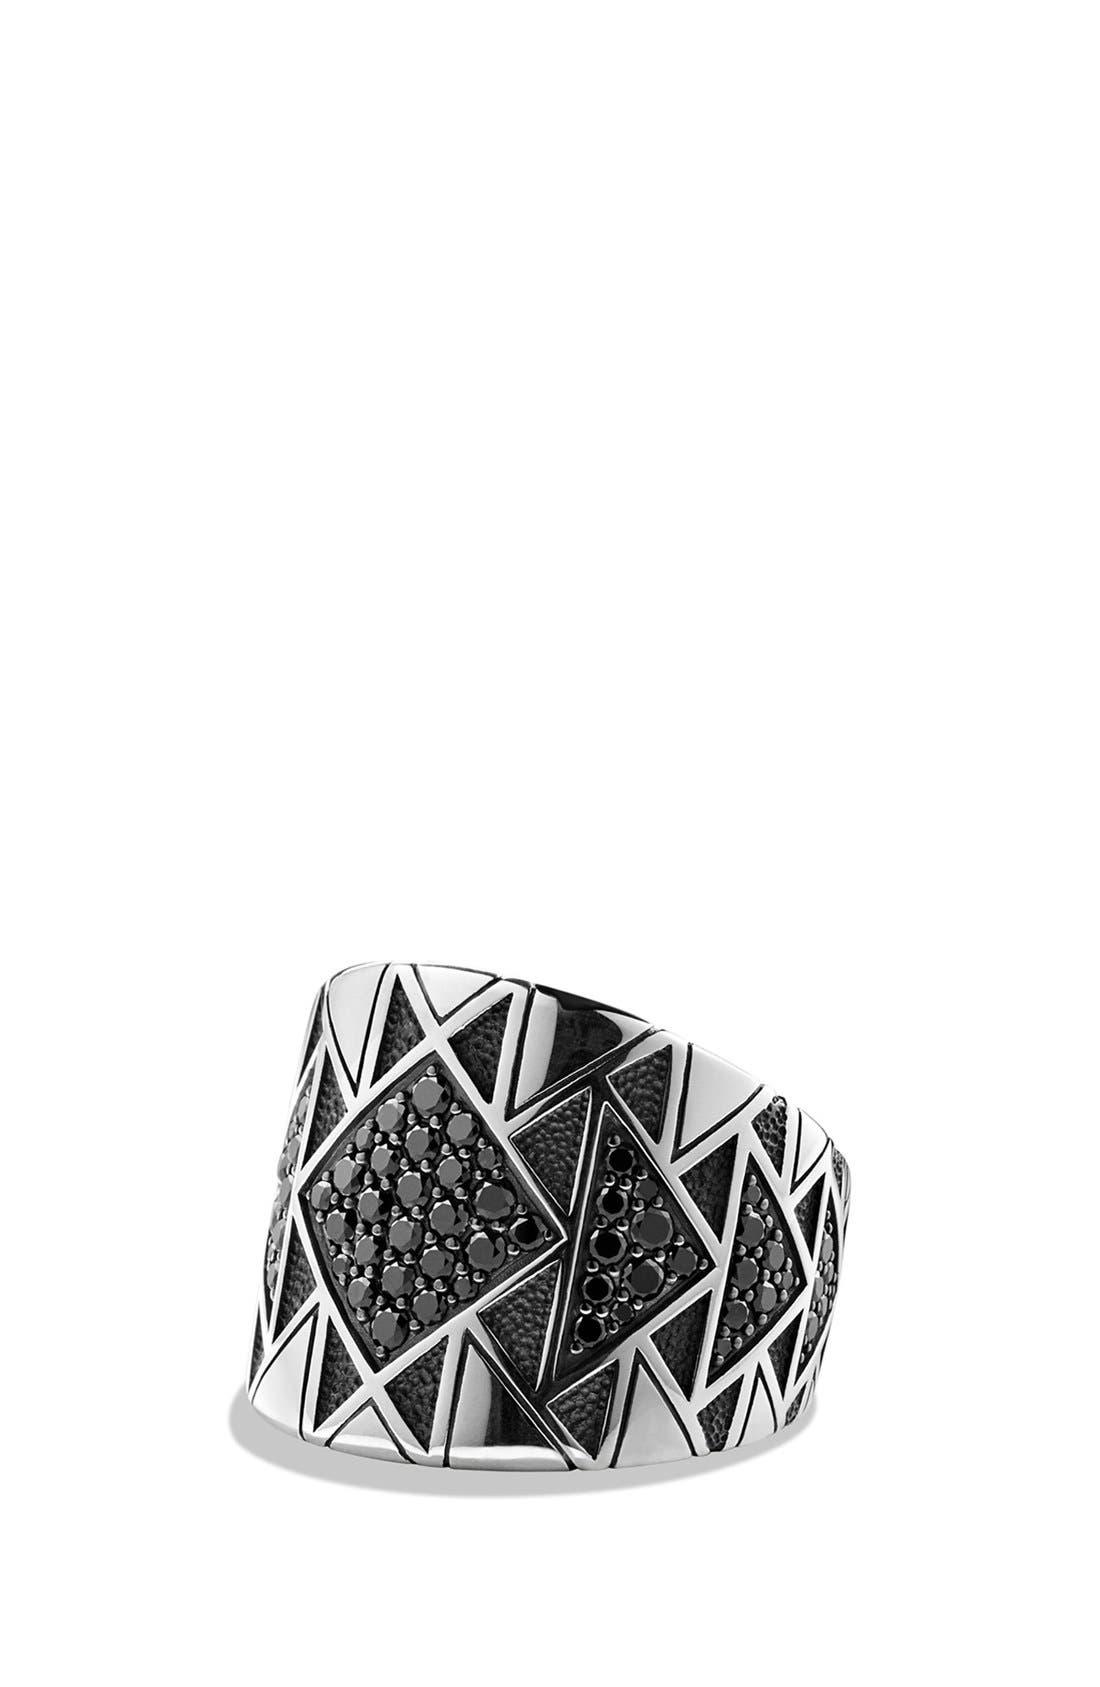 David Yurman 'Frontier' Signet Ring with Black Diamonds